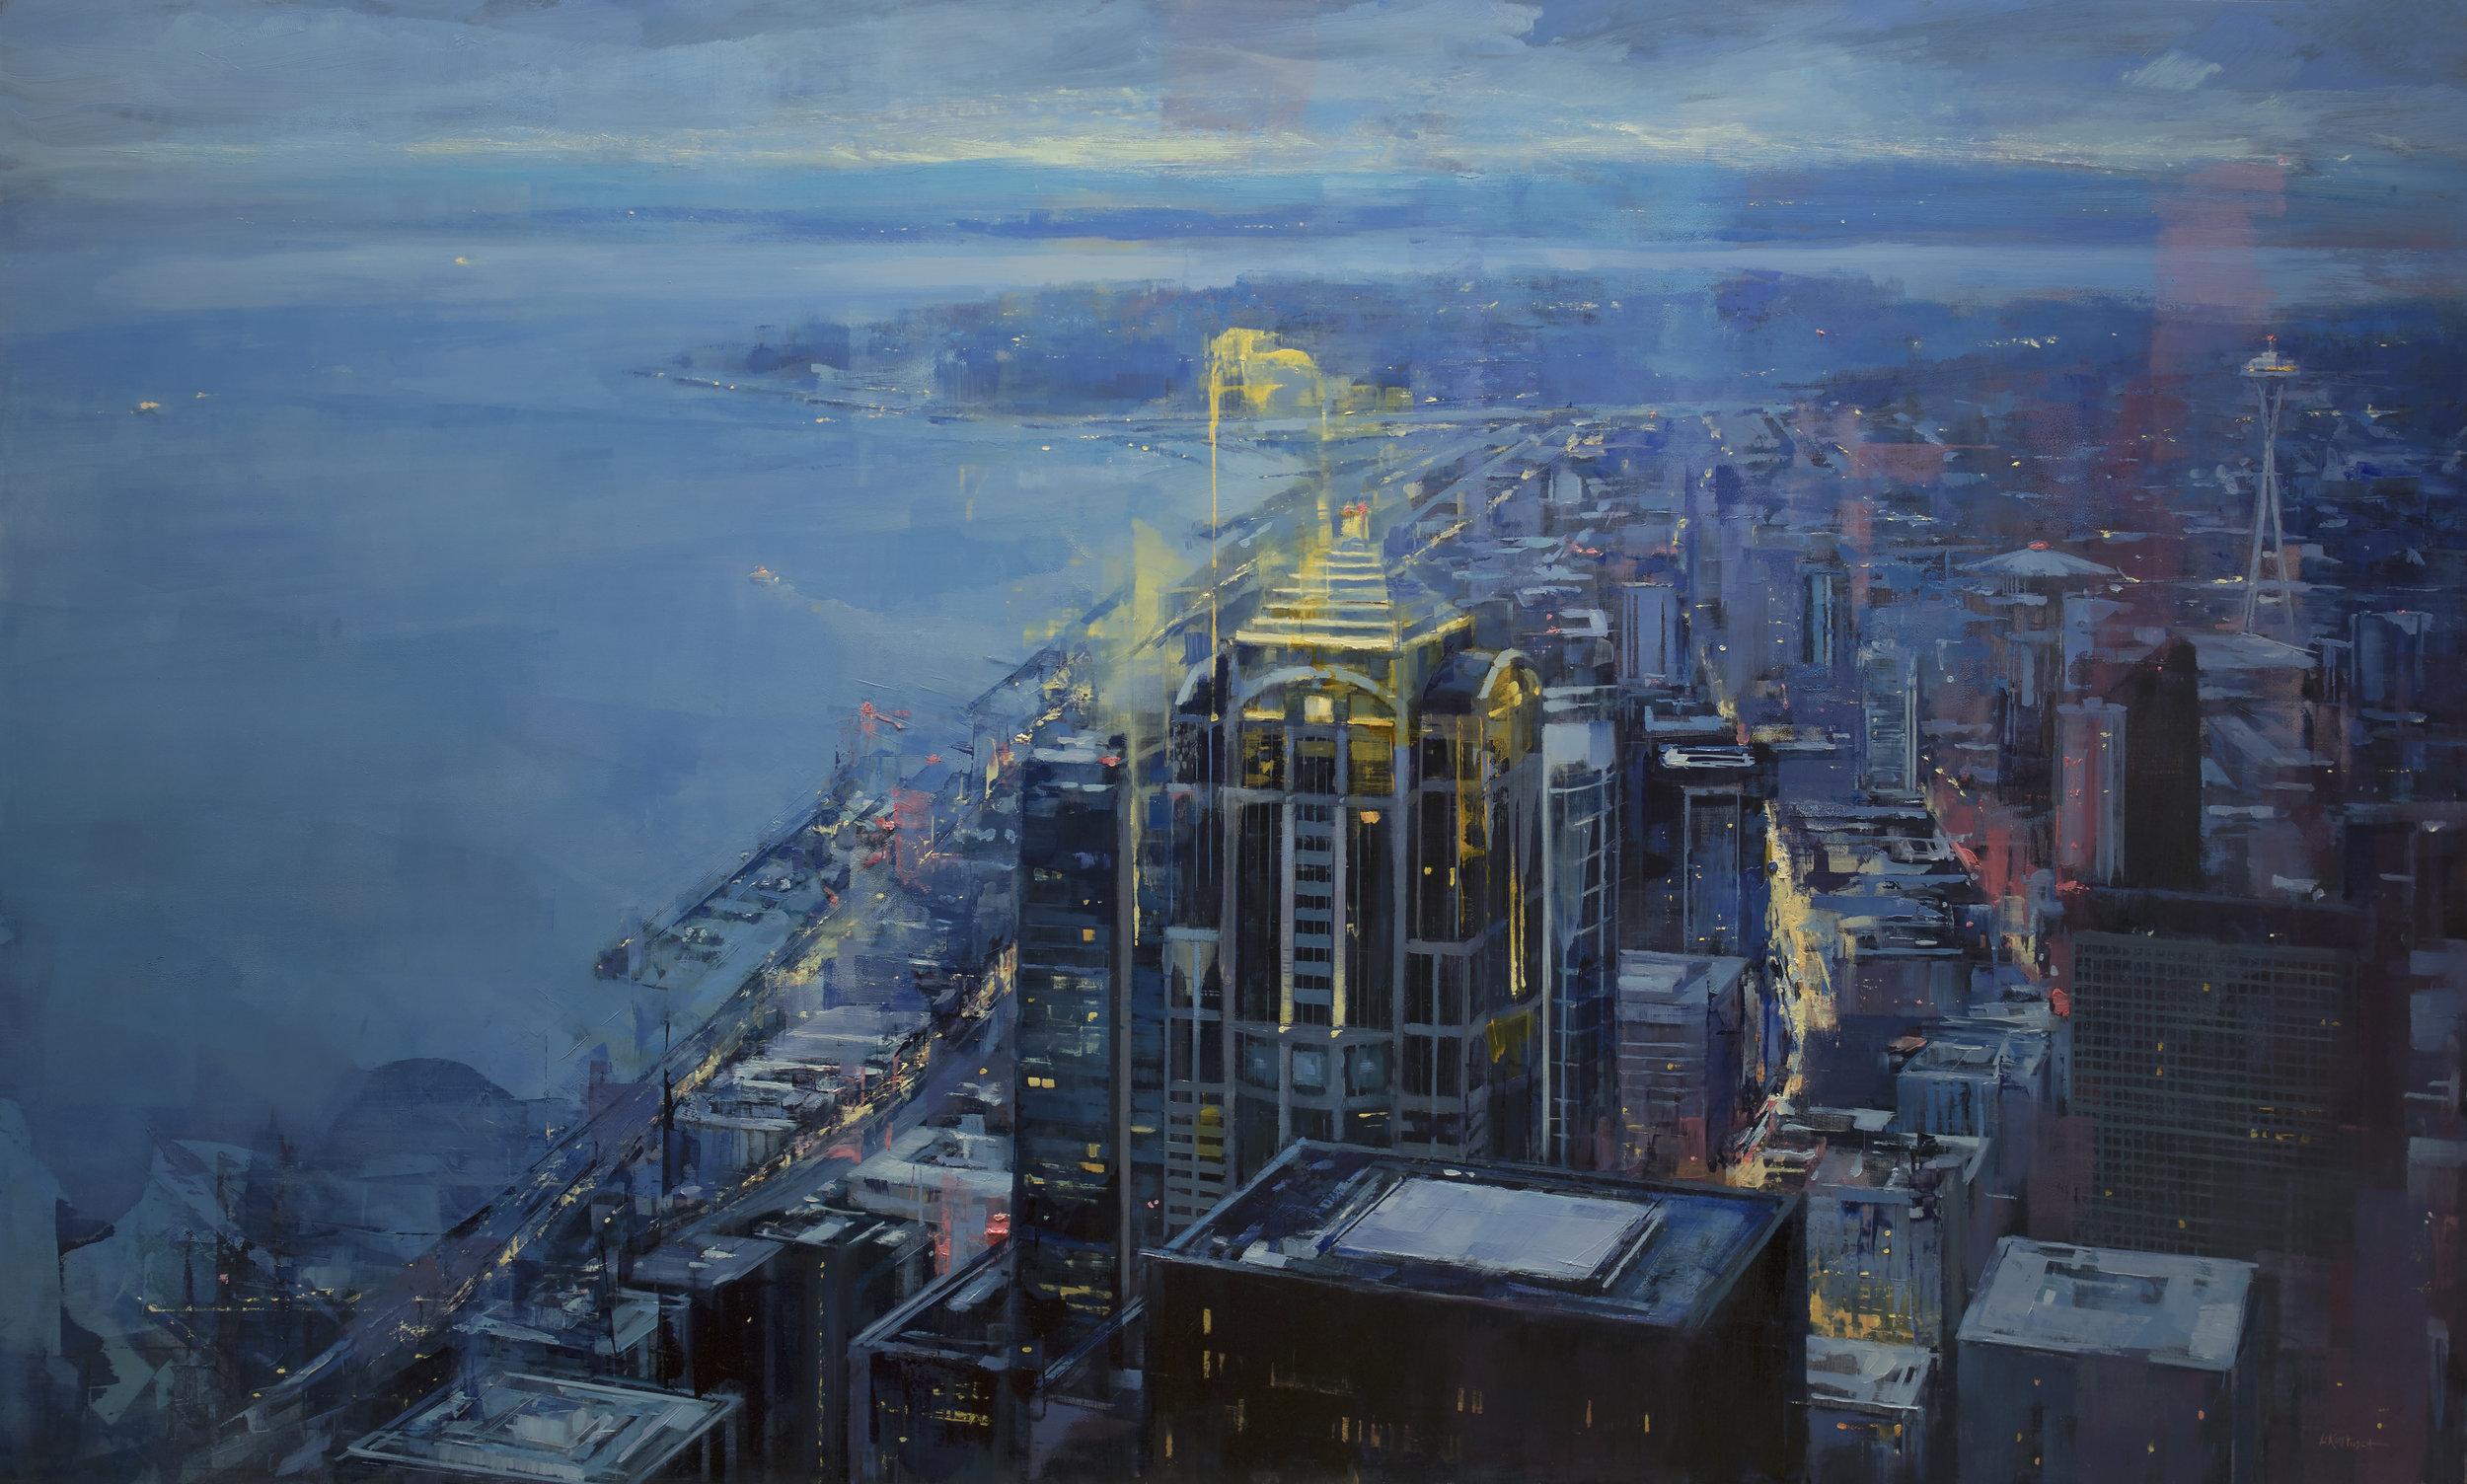 Lindsey Kustusch_%22Evening in The Emerald City%22_28x48_oil on panel_$6,700.jpg